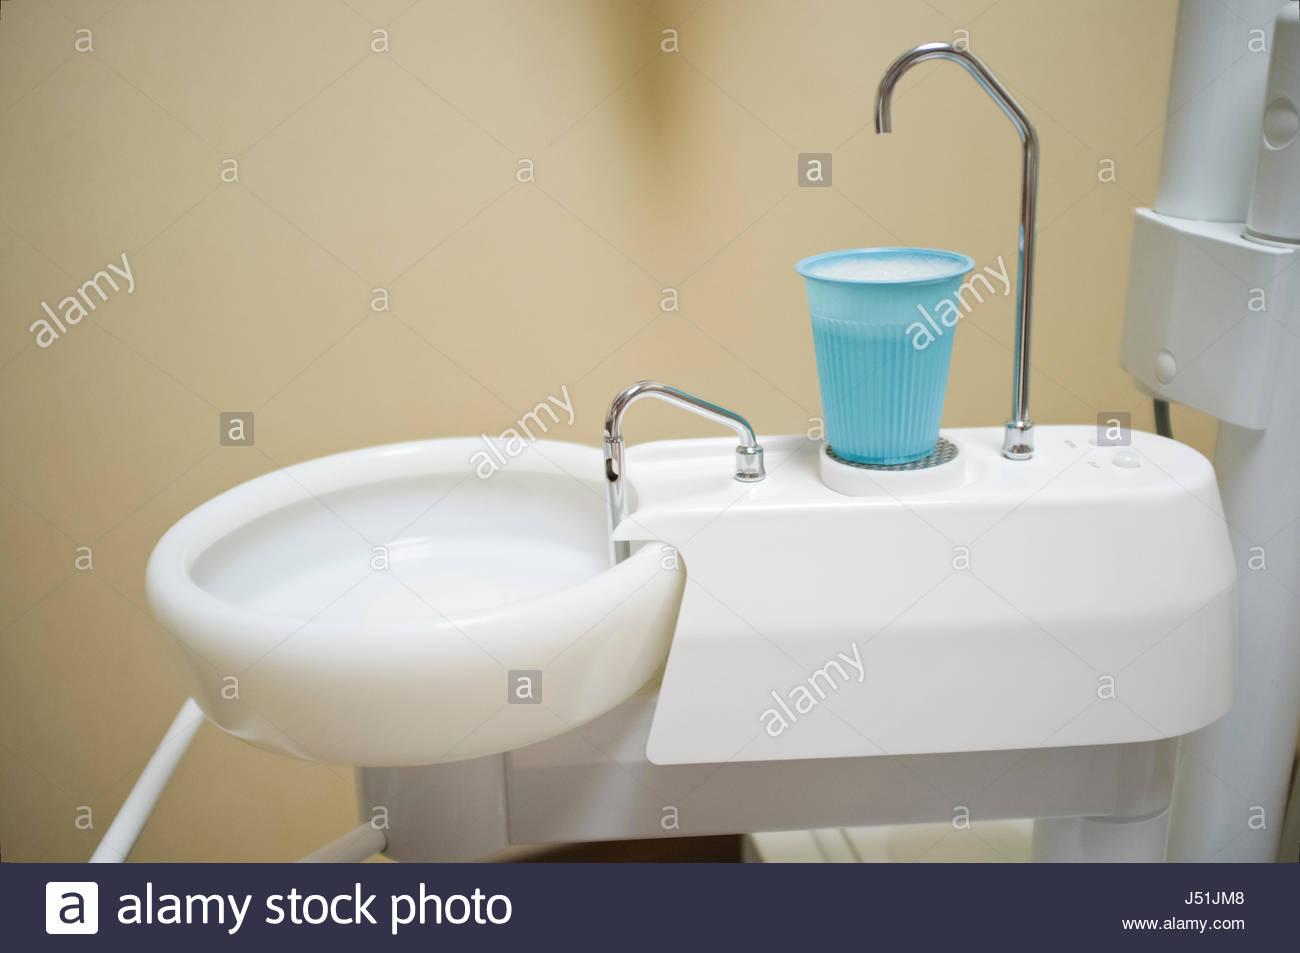 Bathroom Sinks Honolulu small plastic cup and spit sink in dentist office, honolulu, oahu